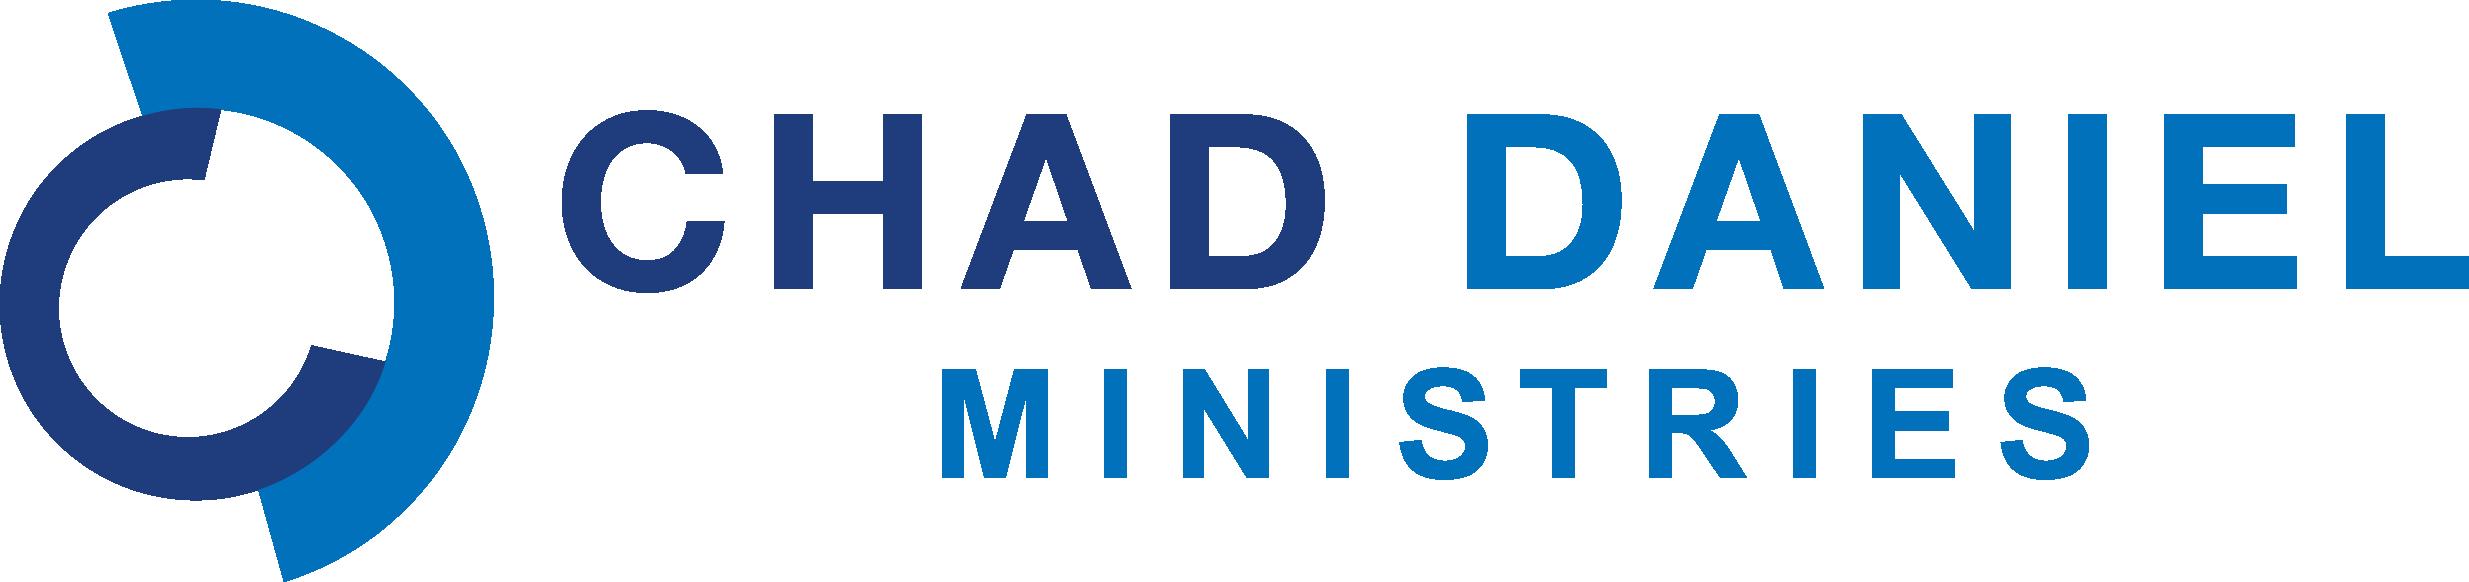 ChadDaniel_Logo_Ministries_Horizontal_Web.png